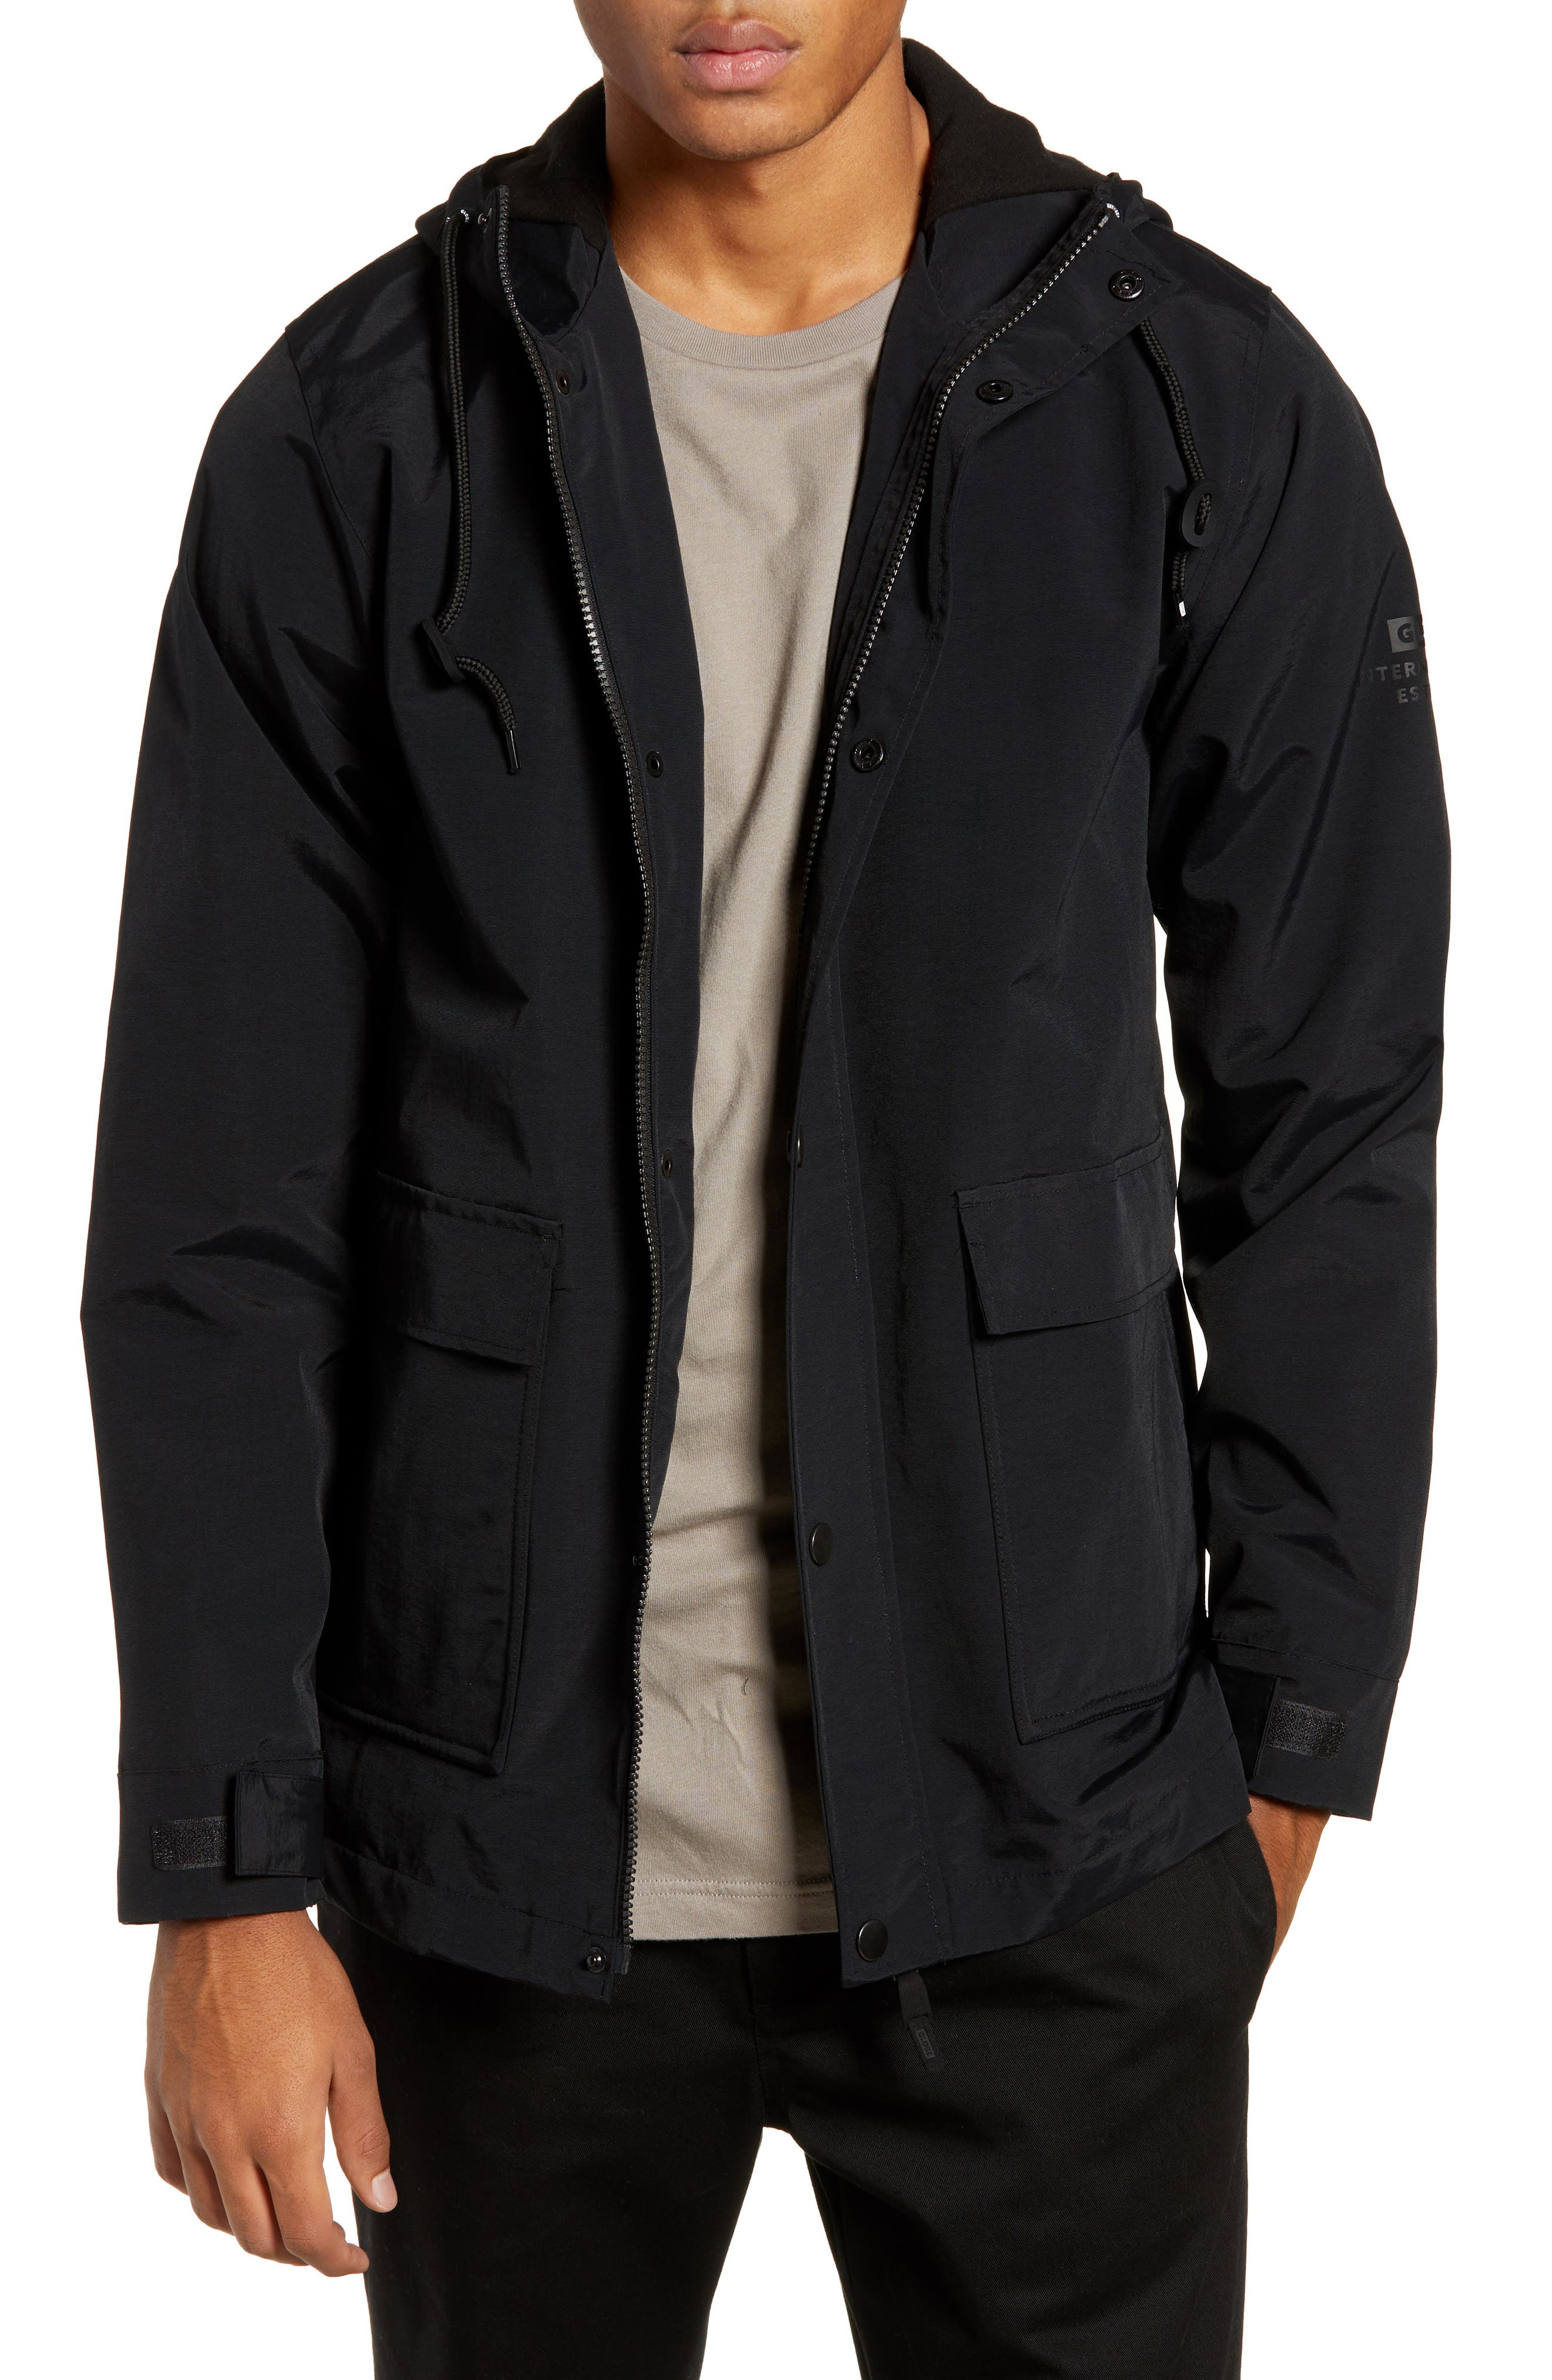 Goodstock Utility Jacket,                             Main thumbnail 1, color,                             BLACK